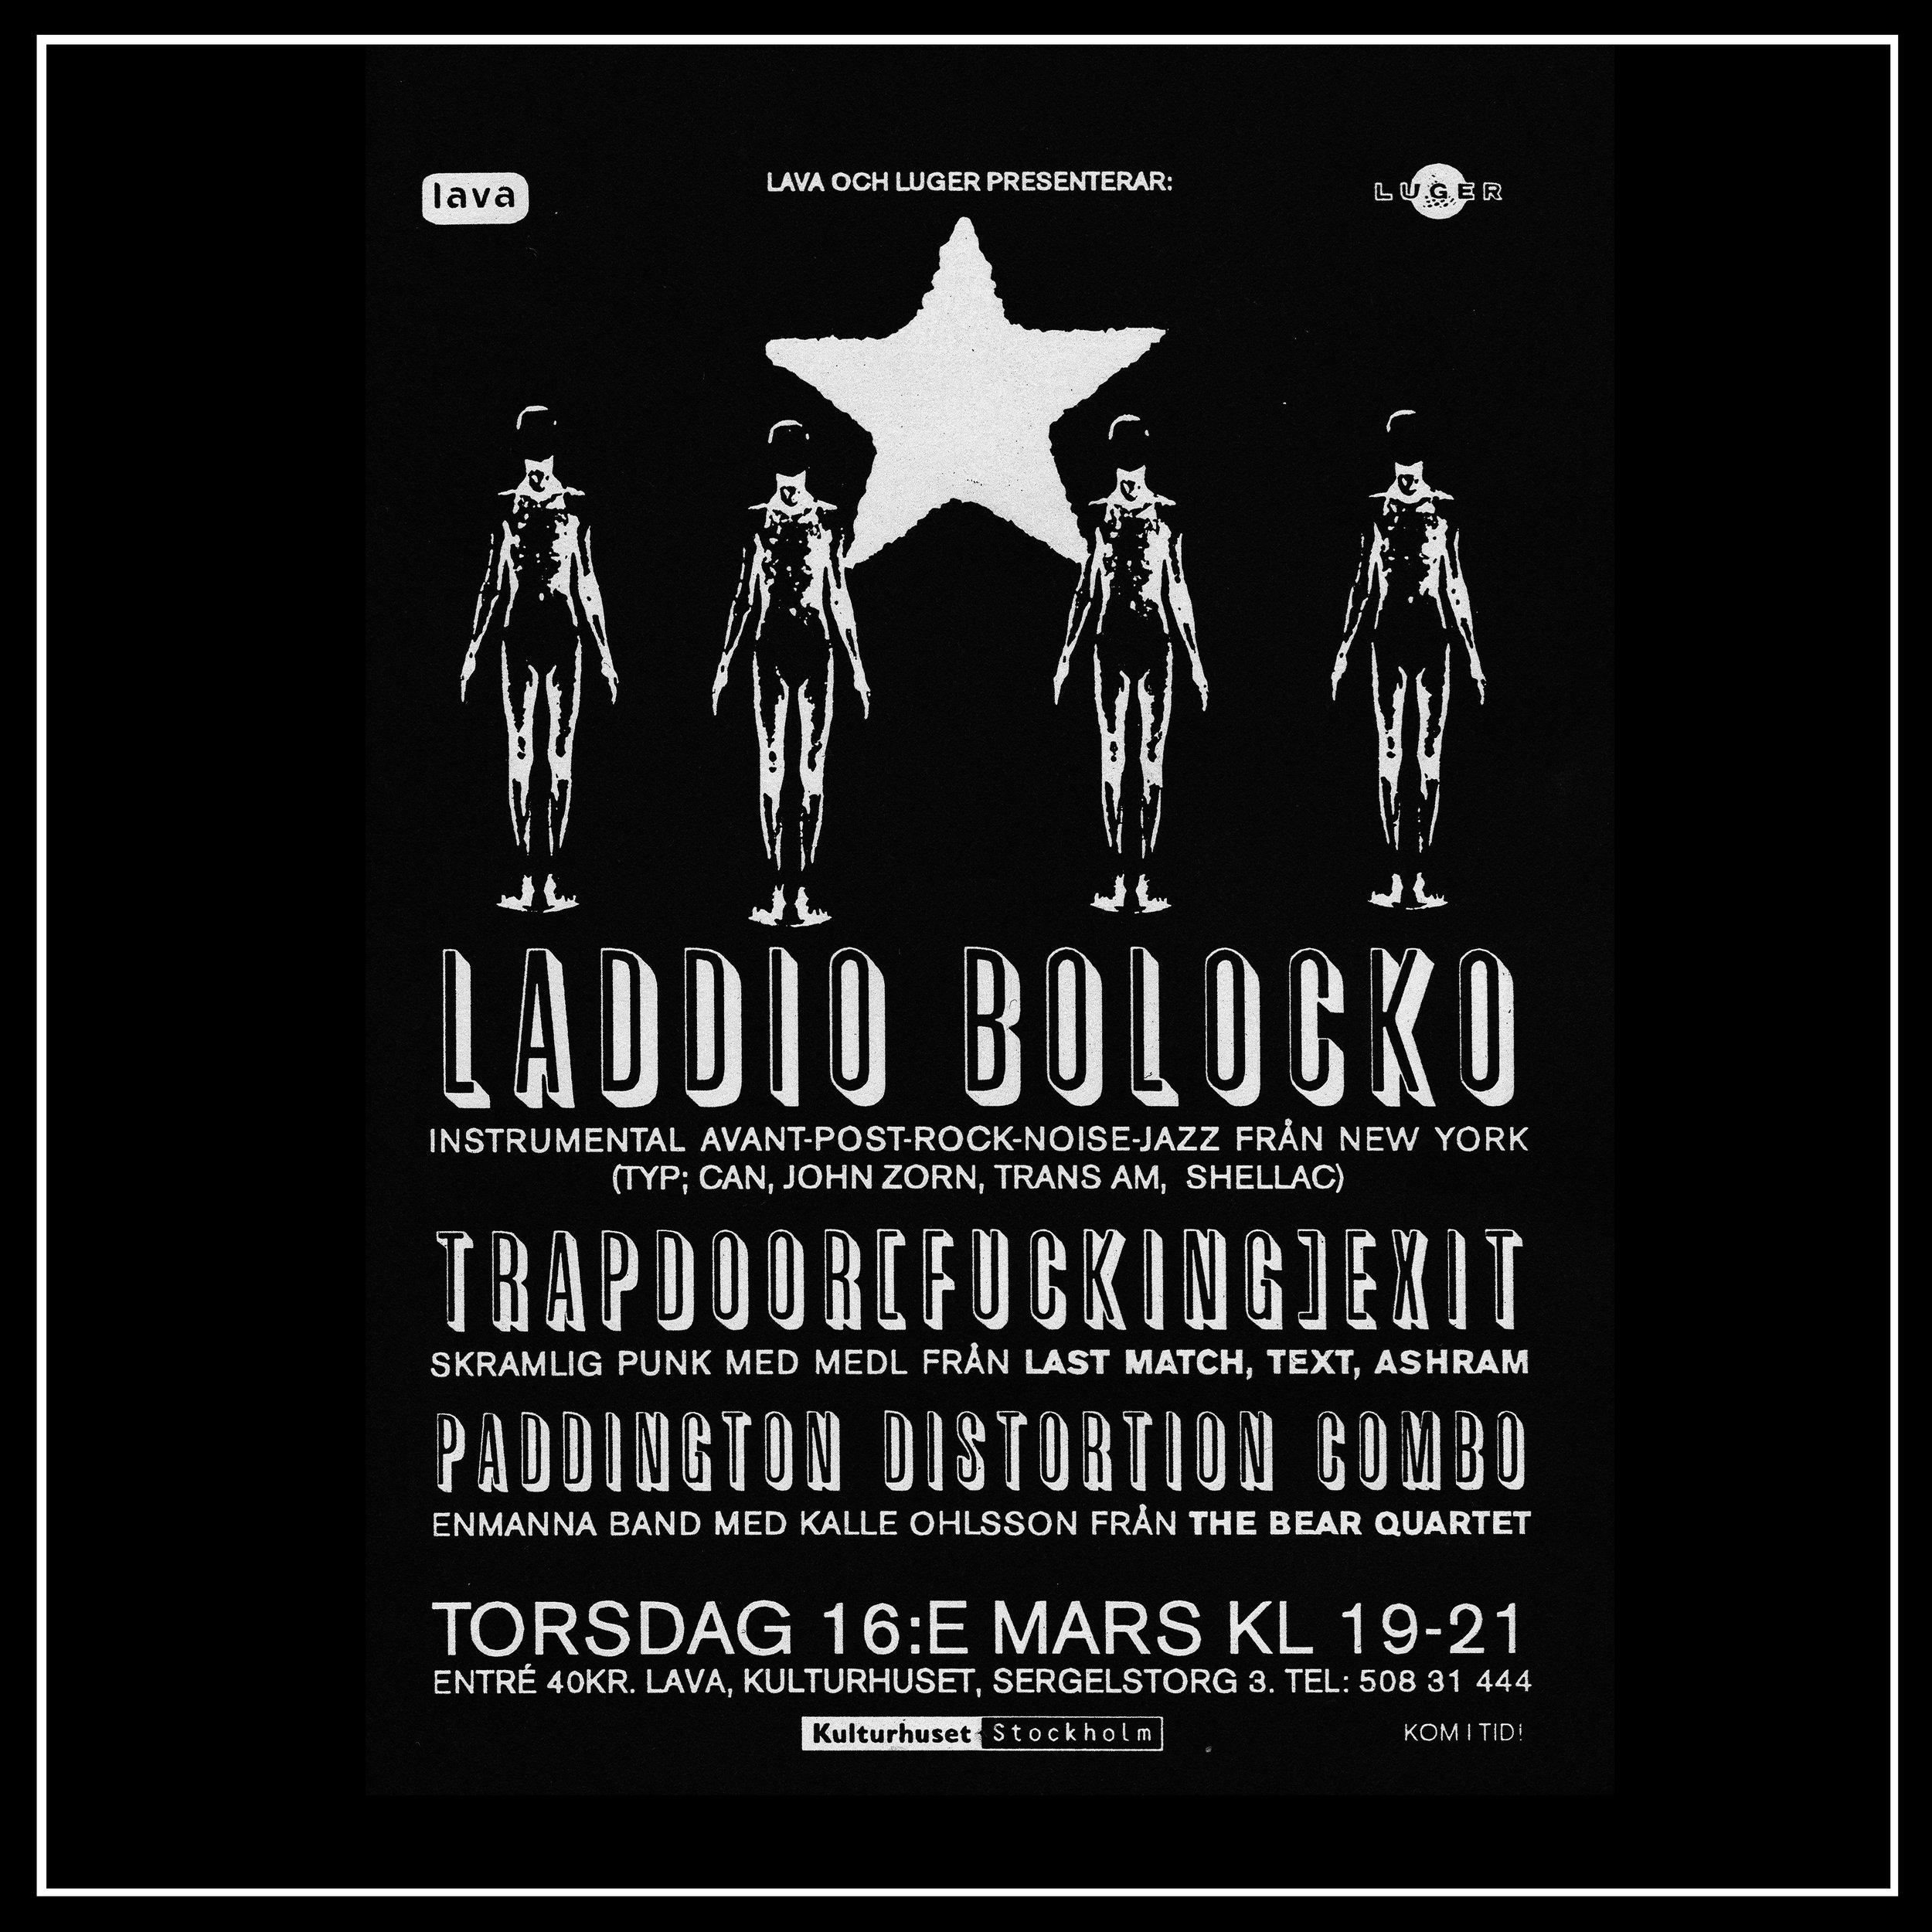 laddio bolocko - more live.jpg